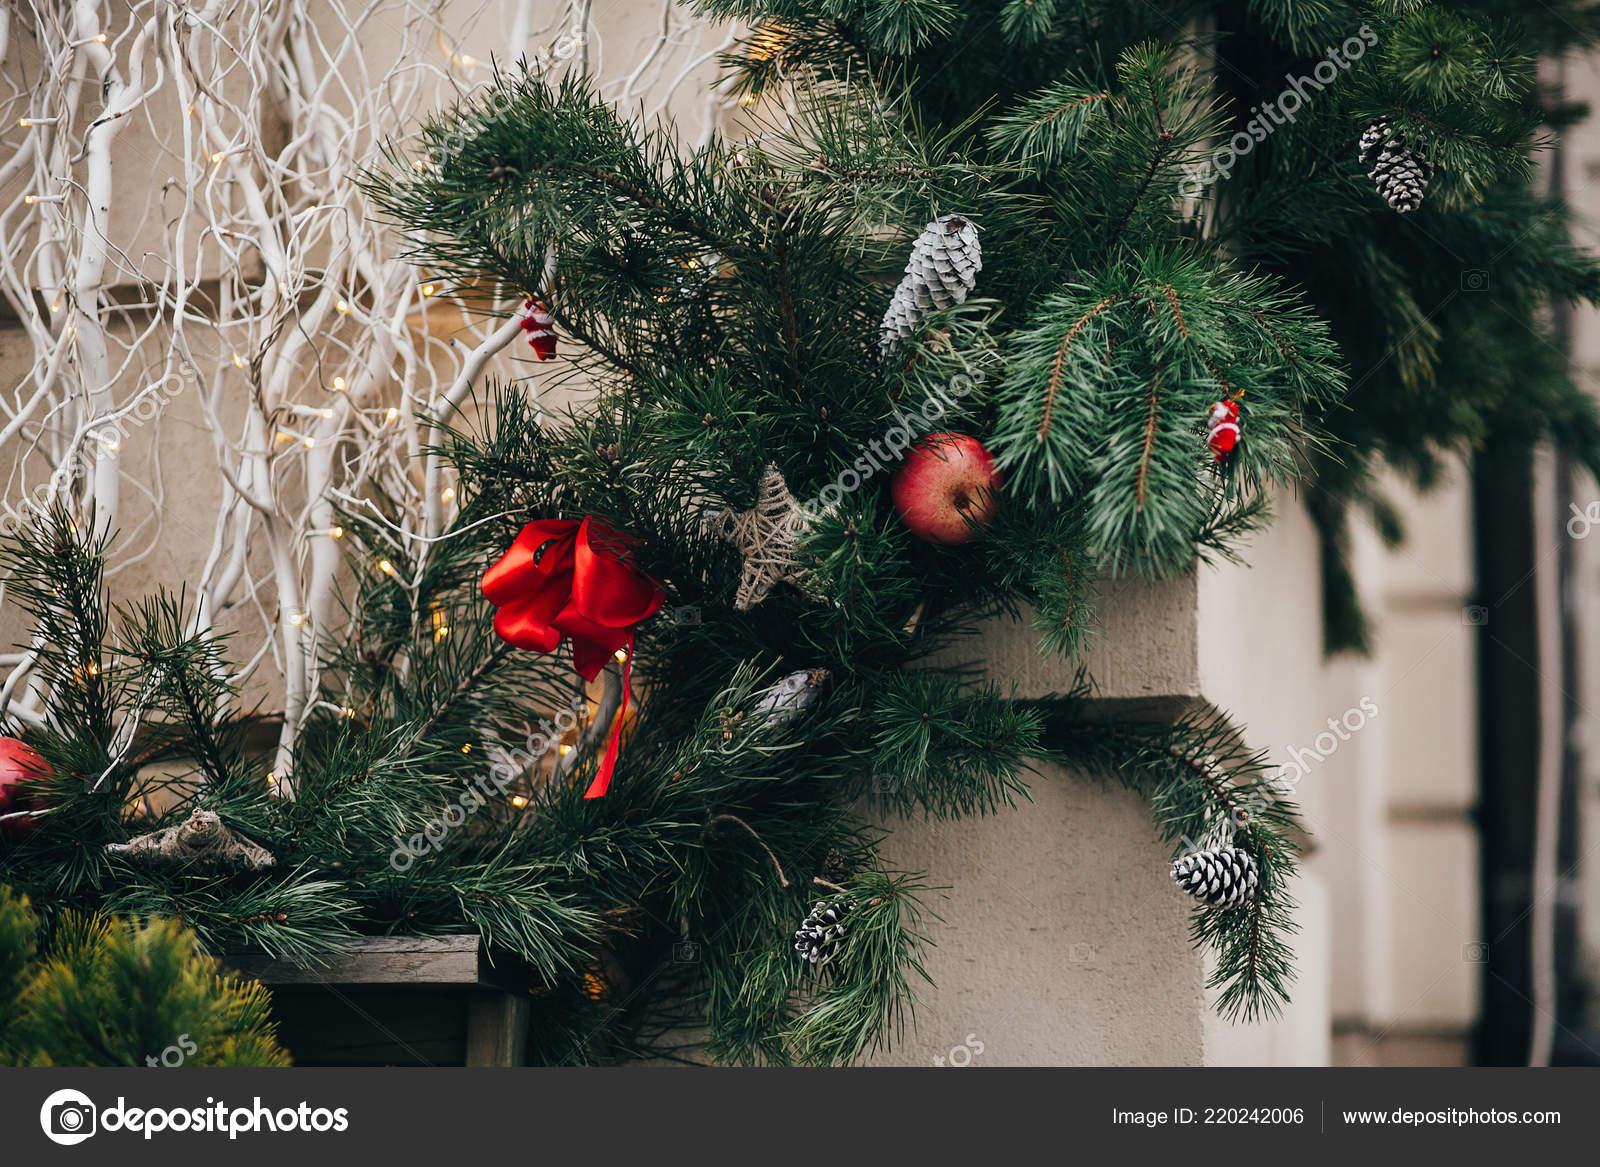 Stylish Christmas Decorations Green Christmas Wreath Red Bows Ornaments Pine Stock Photo C Sonyachny 220242006